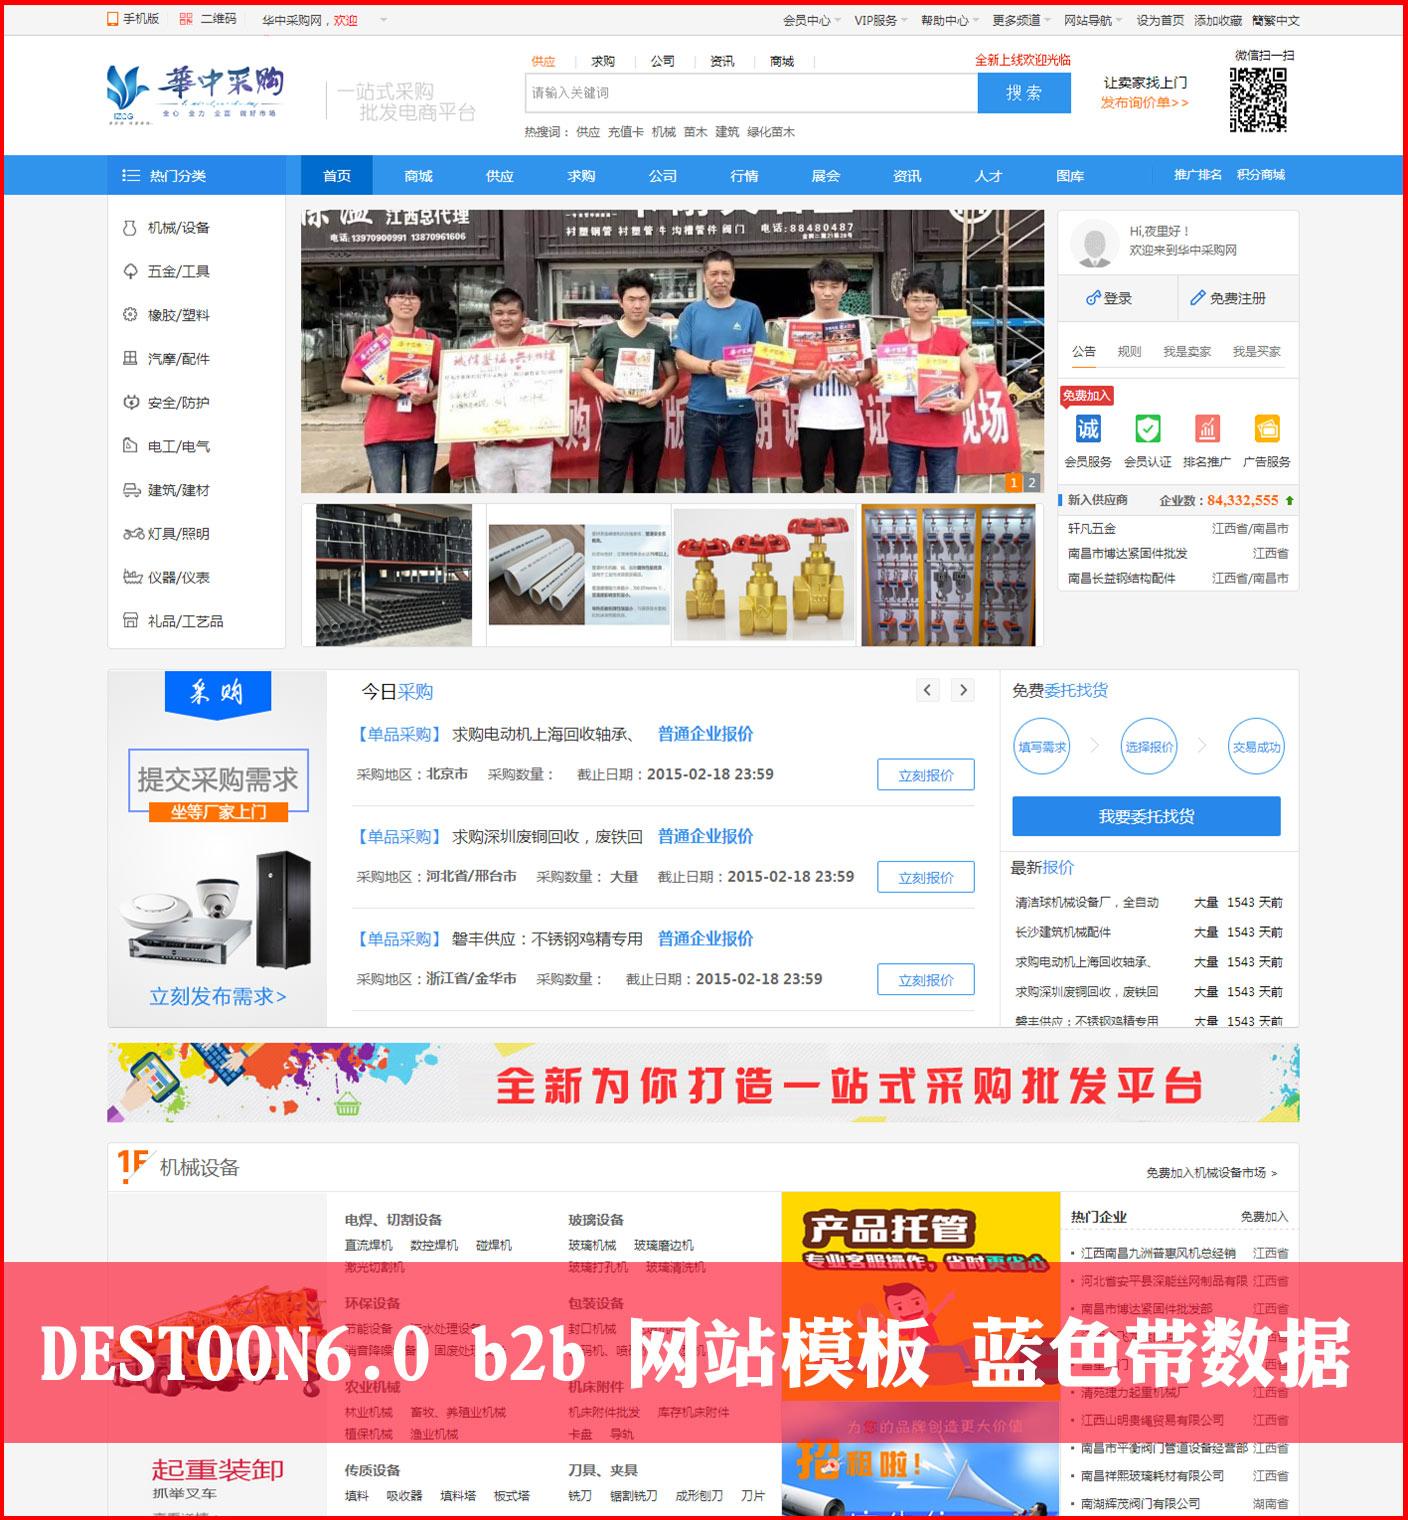 destoon6.0模板 大气蓝色b2b宽屏模板 DT模板 destoon网站源码